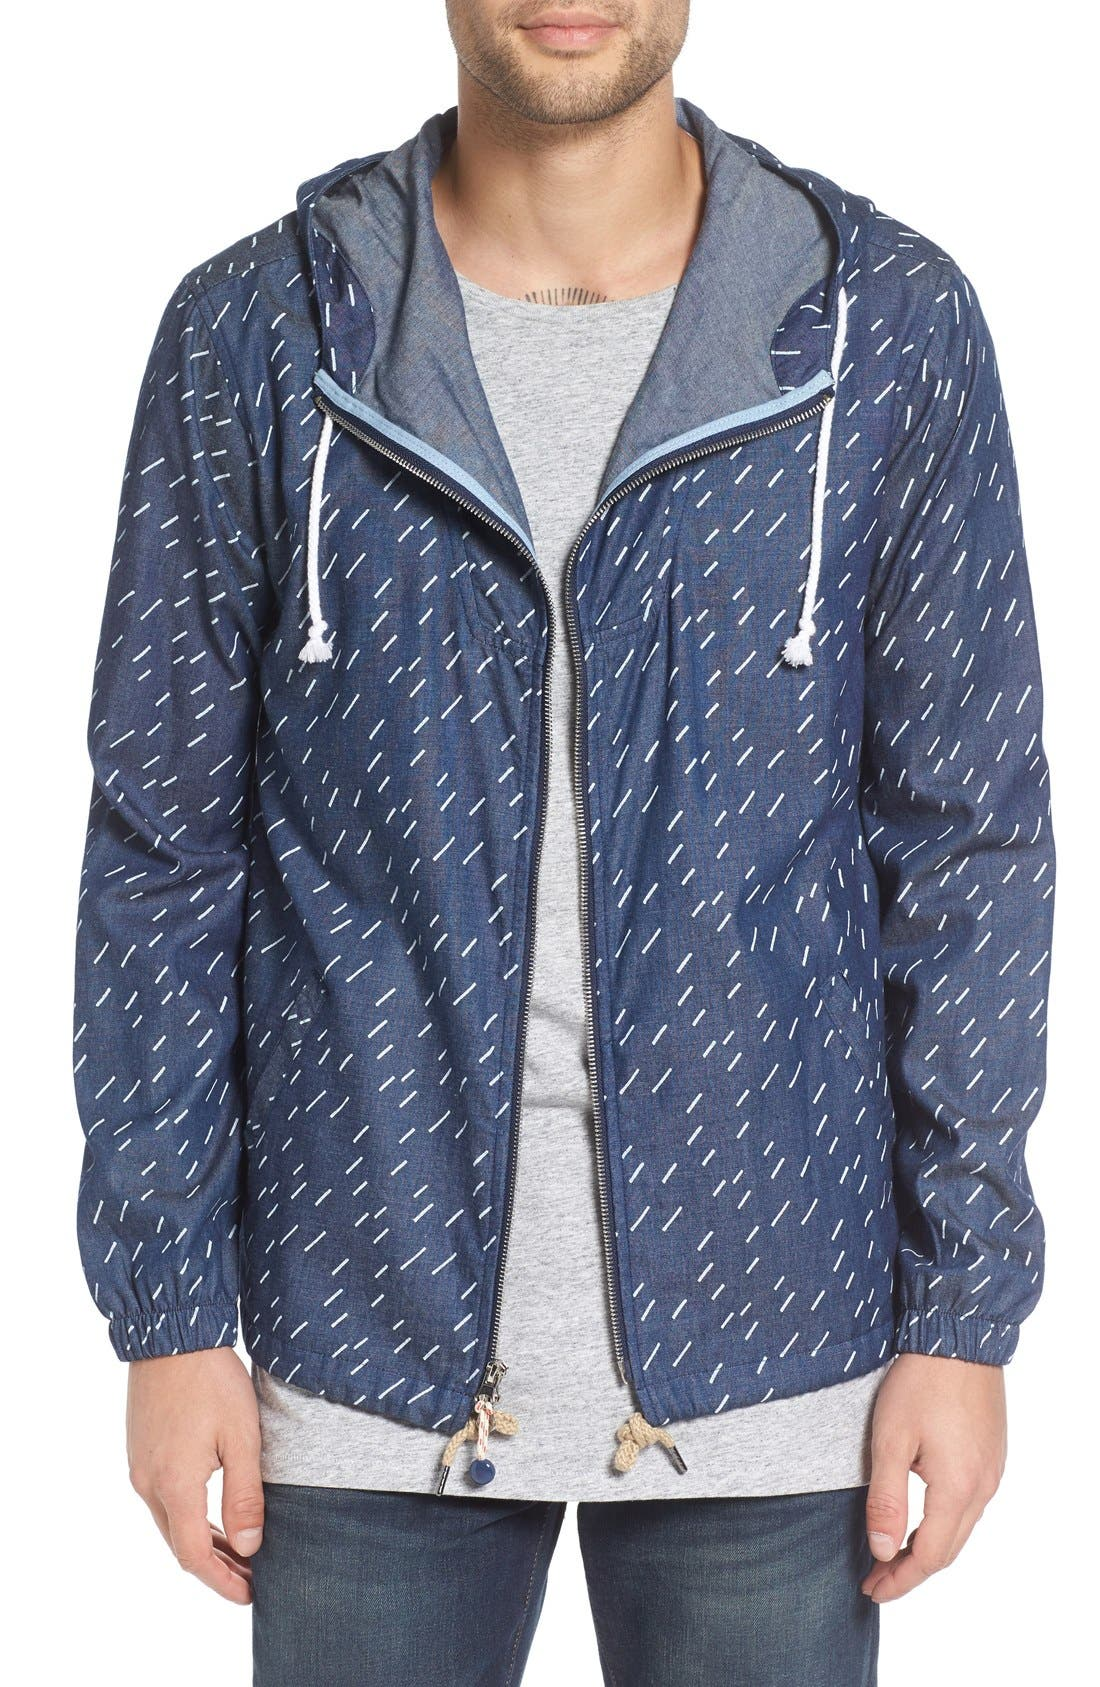 Altru 'Foundry' Rain Print Chambray Jacket